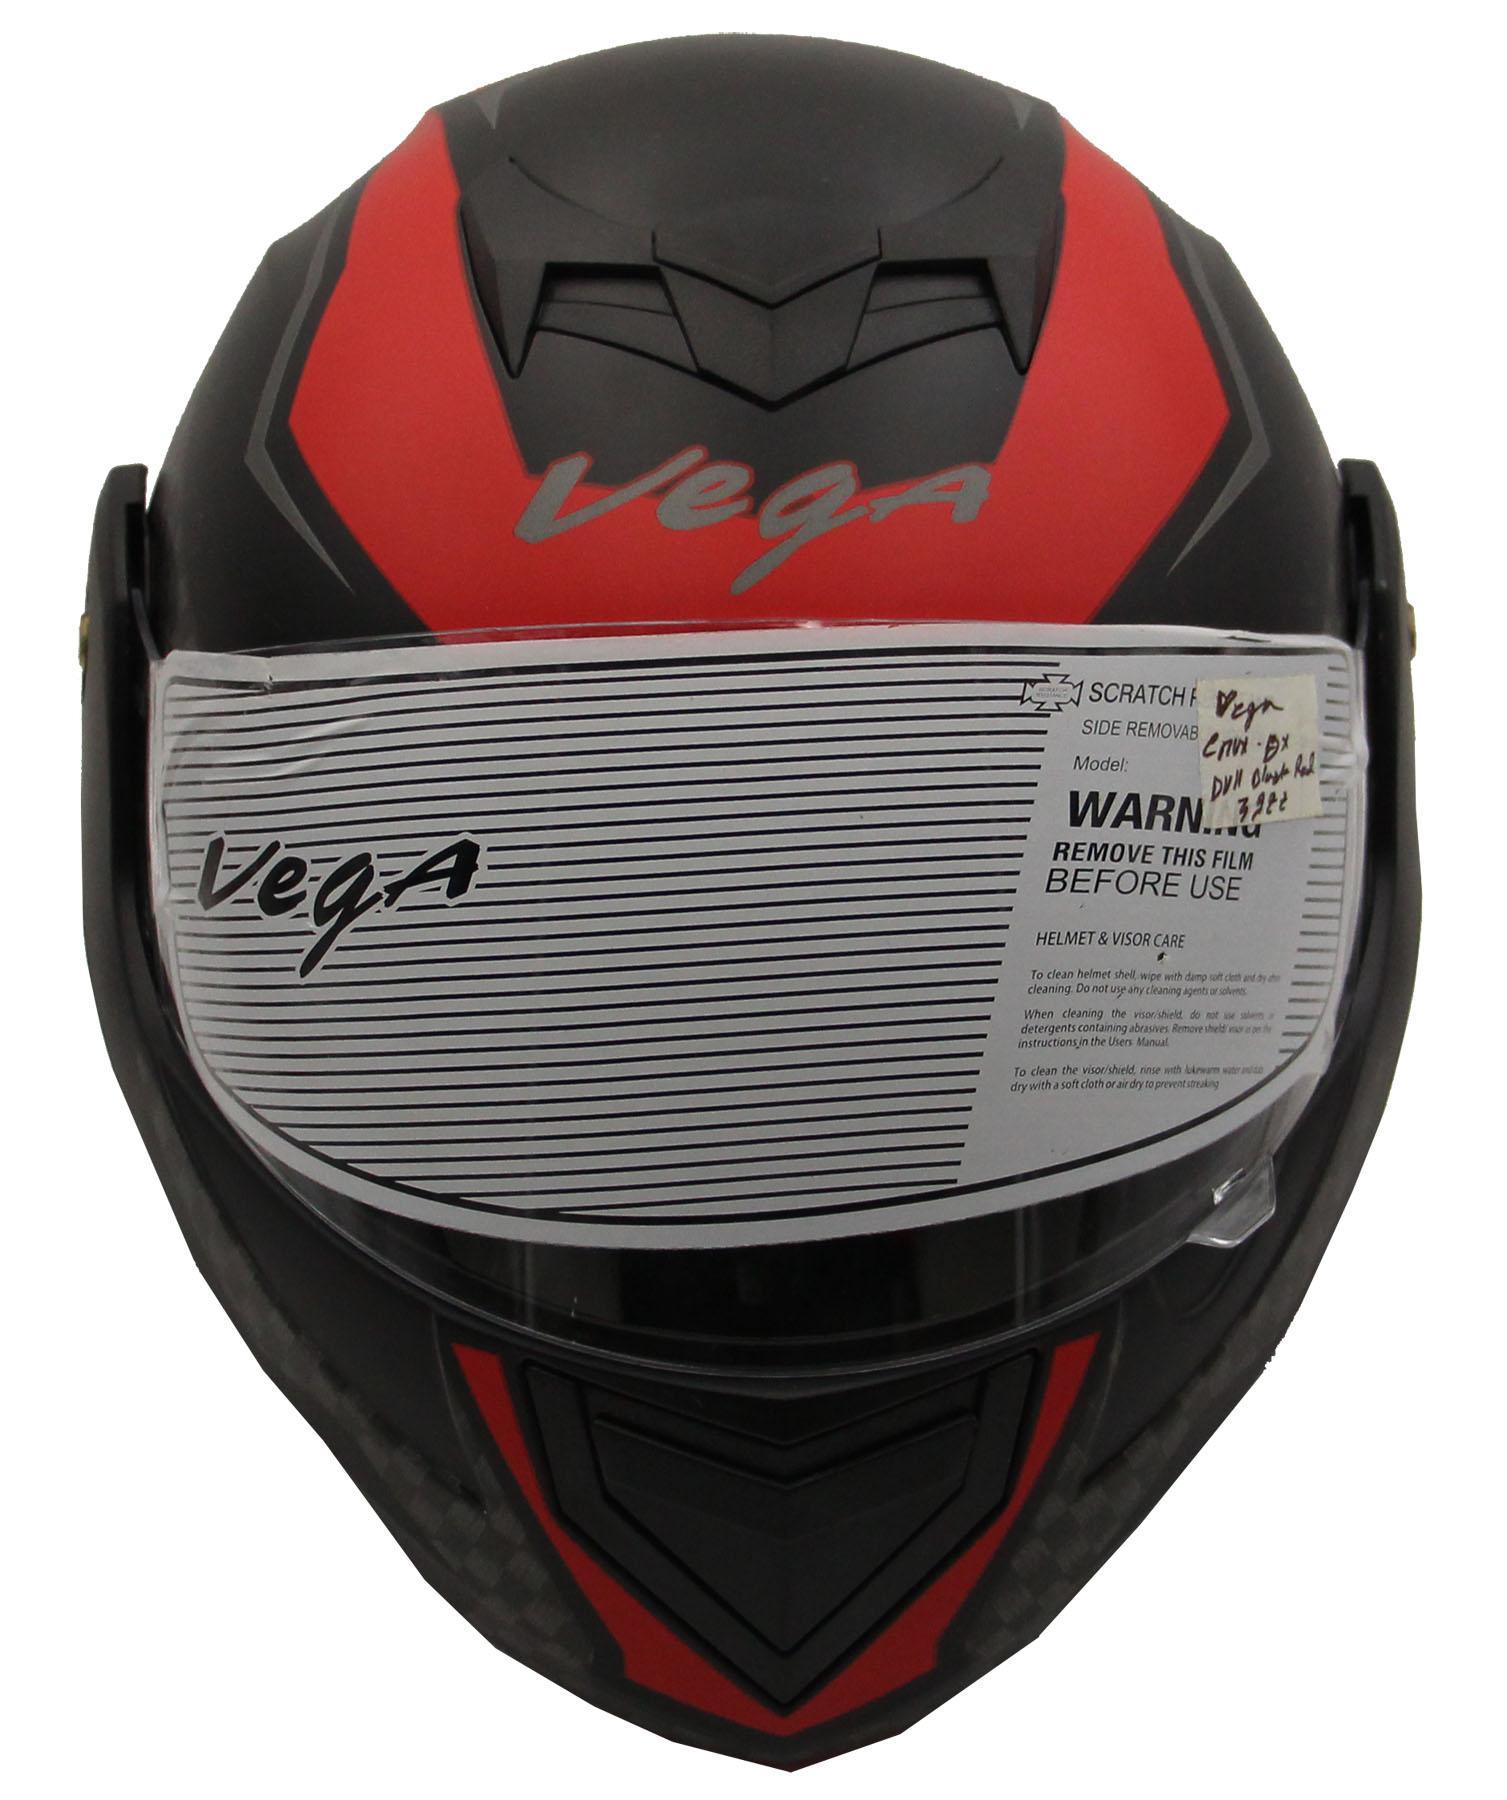 8f257b2b Helmet Price In Bangladesh - Buy Bike Helmet From Daraz.com.bd